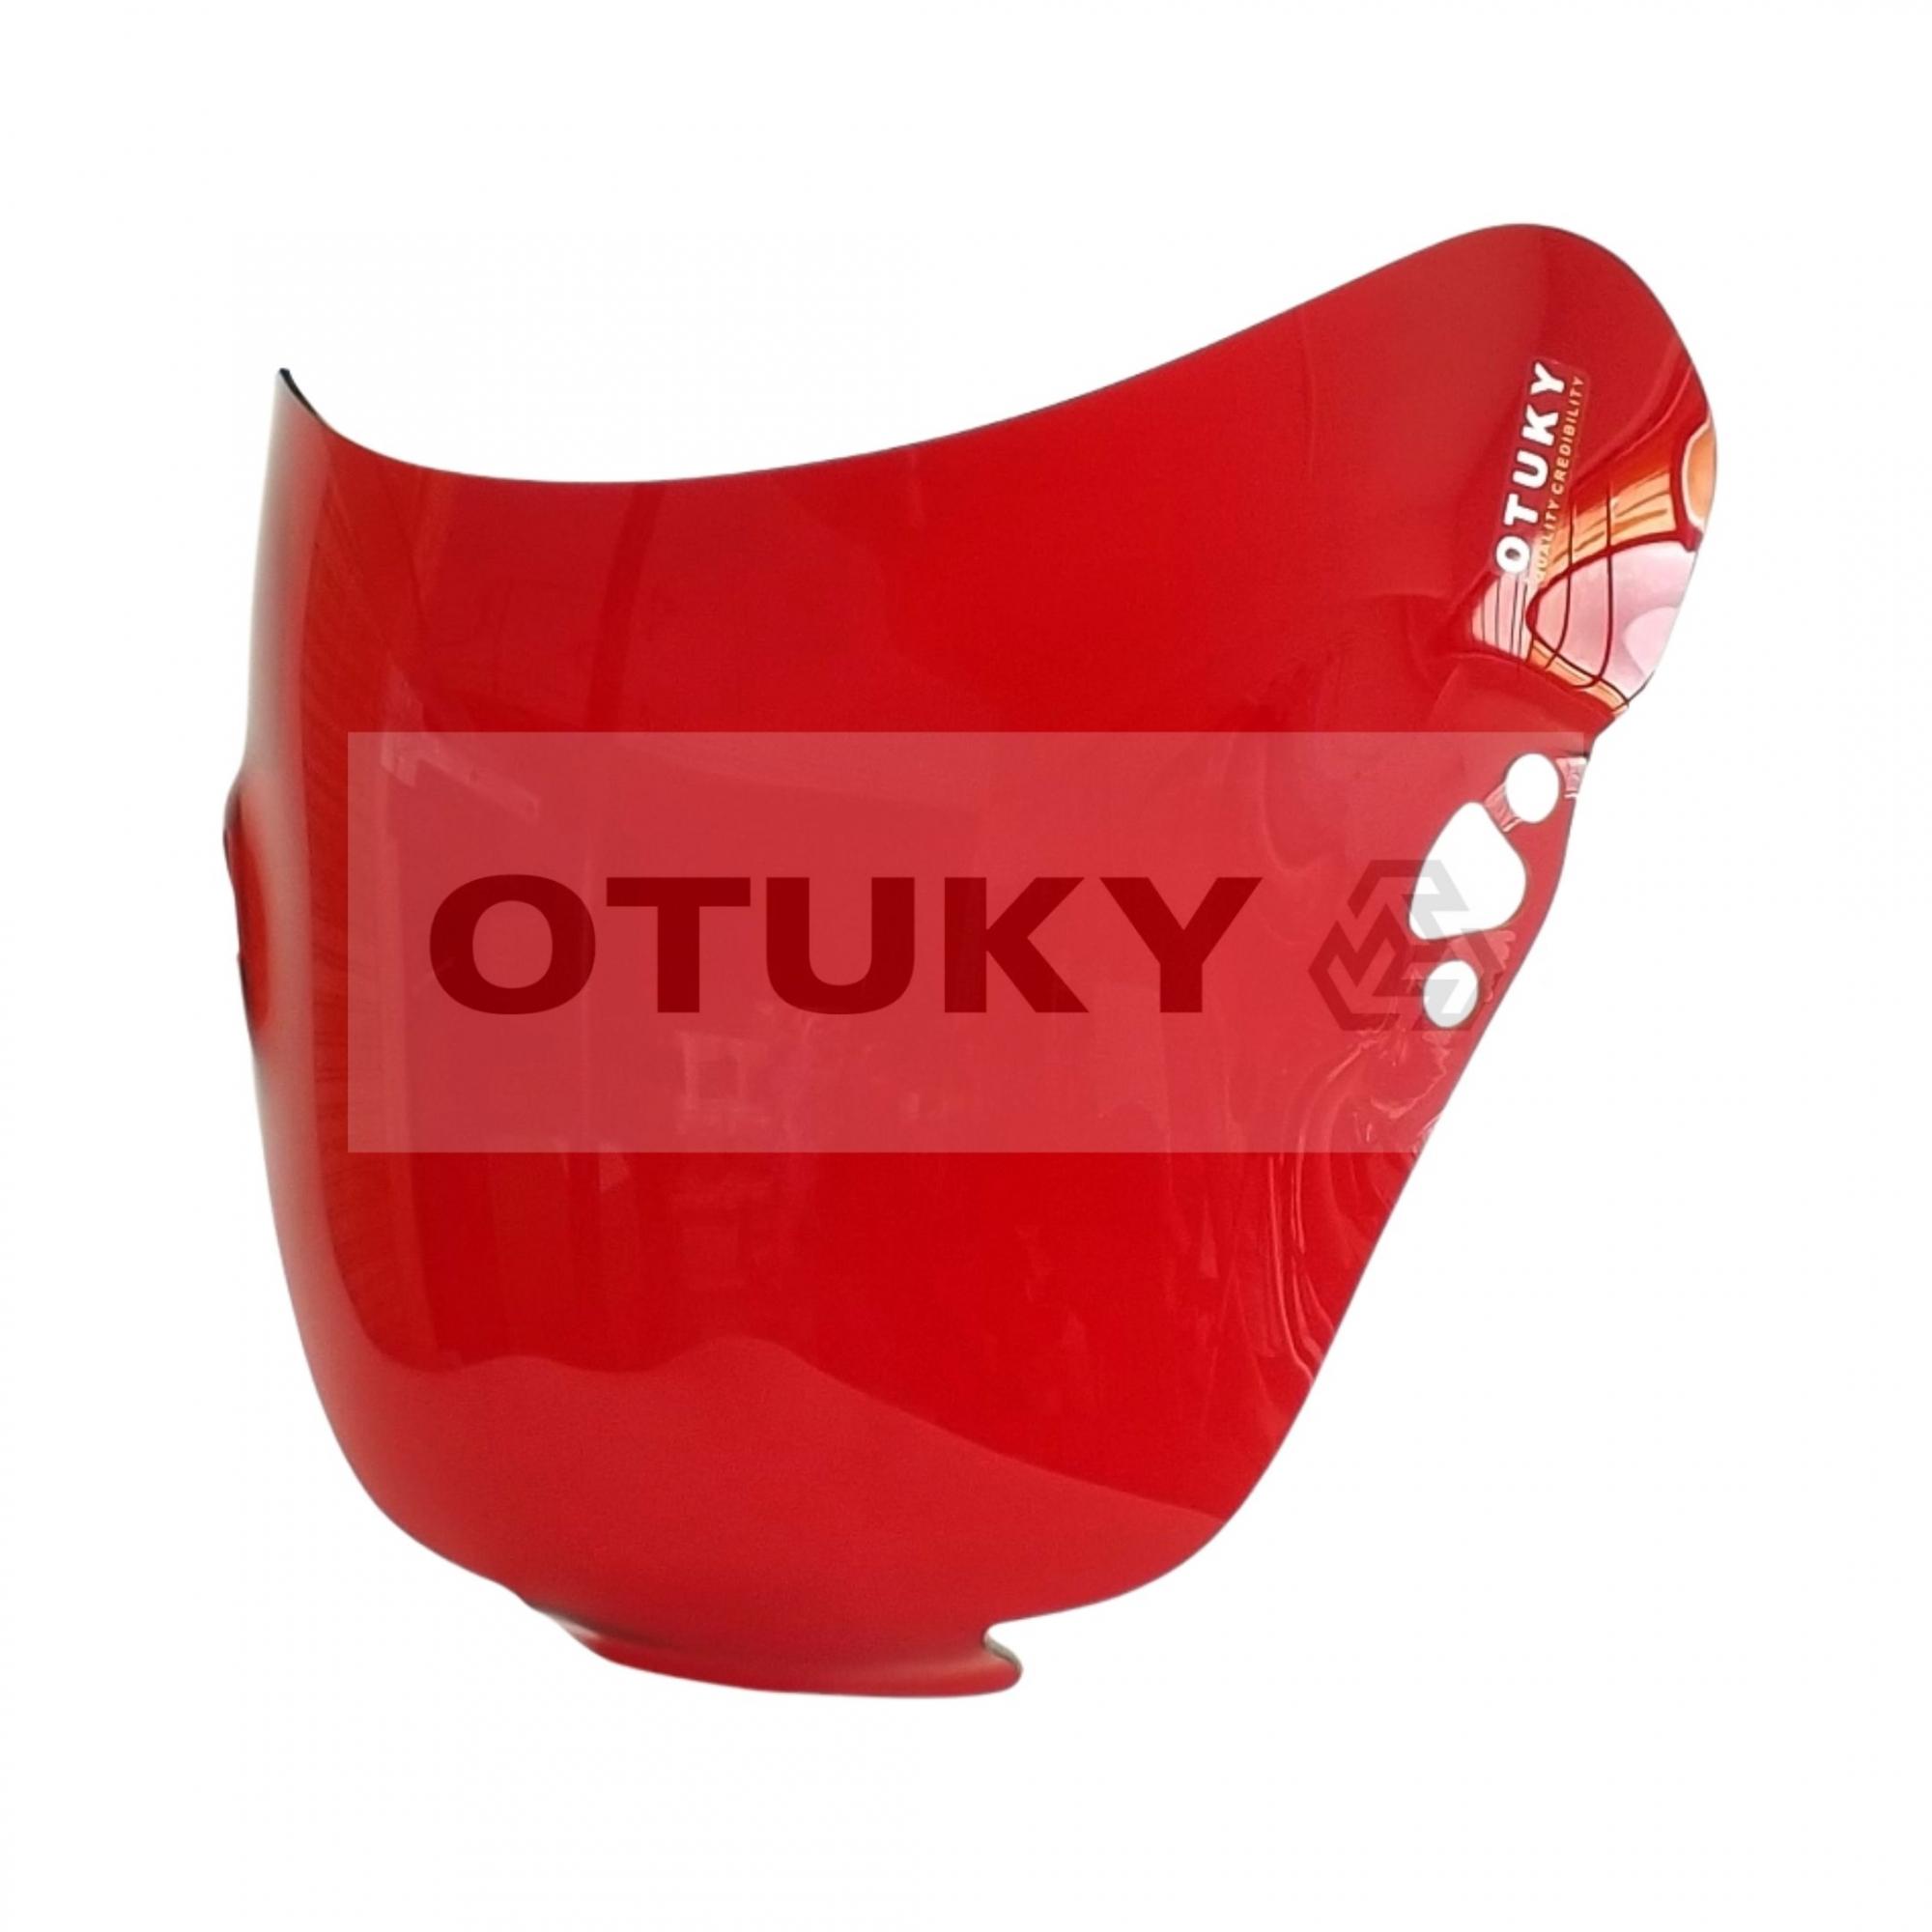 Bolha para Moto CBR 600 F2 1991 1992 1993 1994 Otuky